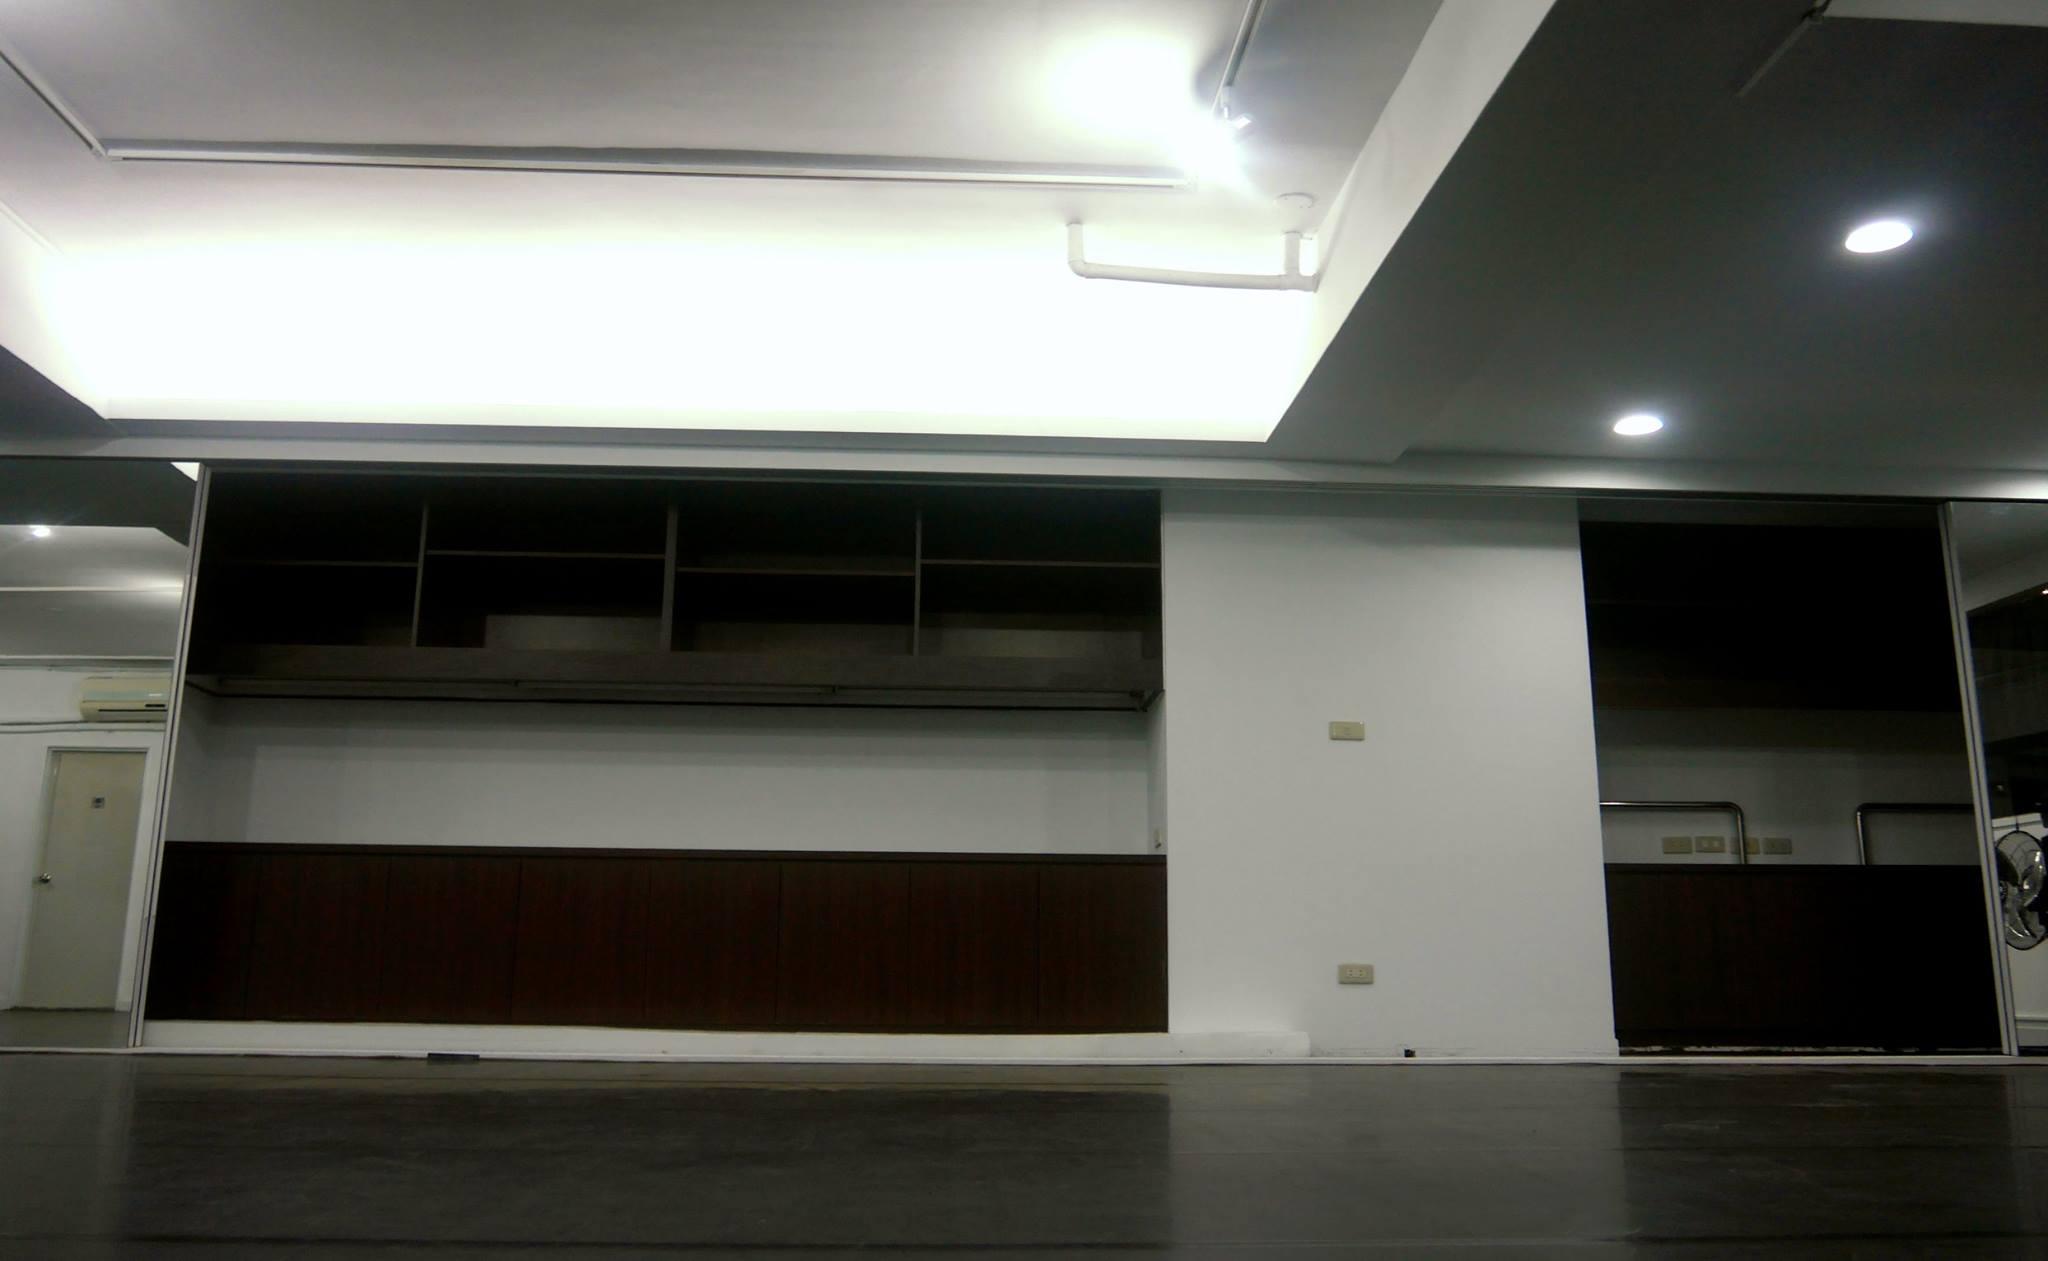 Vaste Studio/西門町空間租借/大型舞蹈教室/攝影棚承租/排練場地/展演空間/30坪/0976517460 - 20150316000151-435455754.jpg(圖)